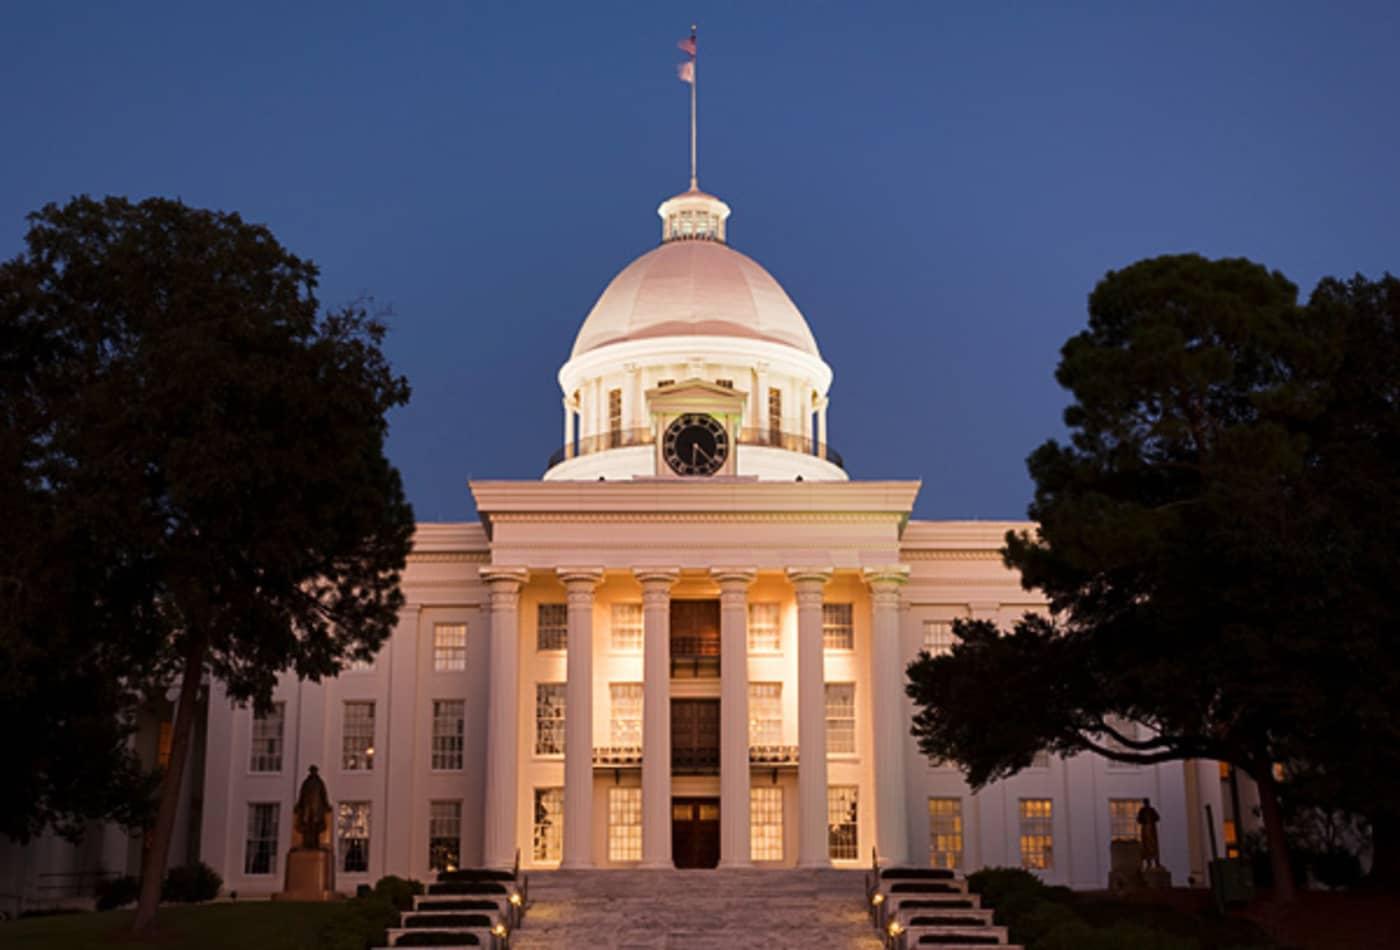 Alabama-American-Tax-Havens-CNBC.jpg